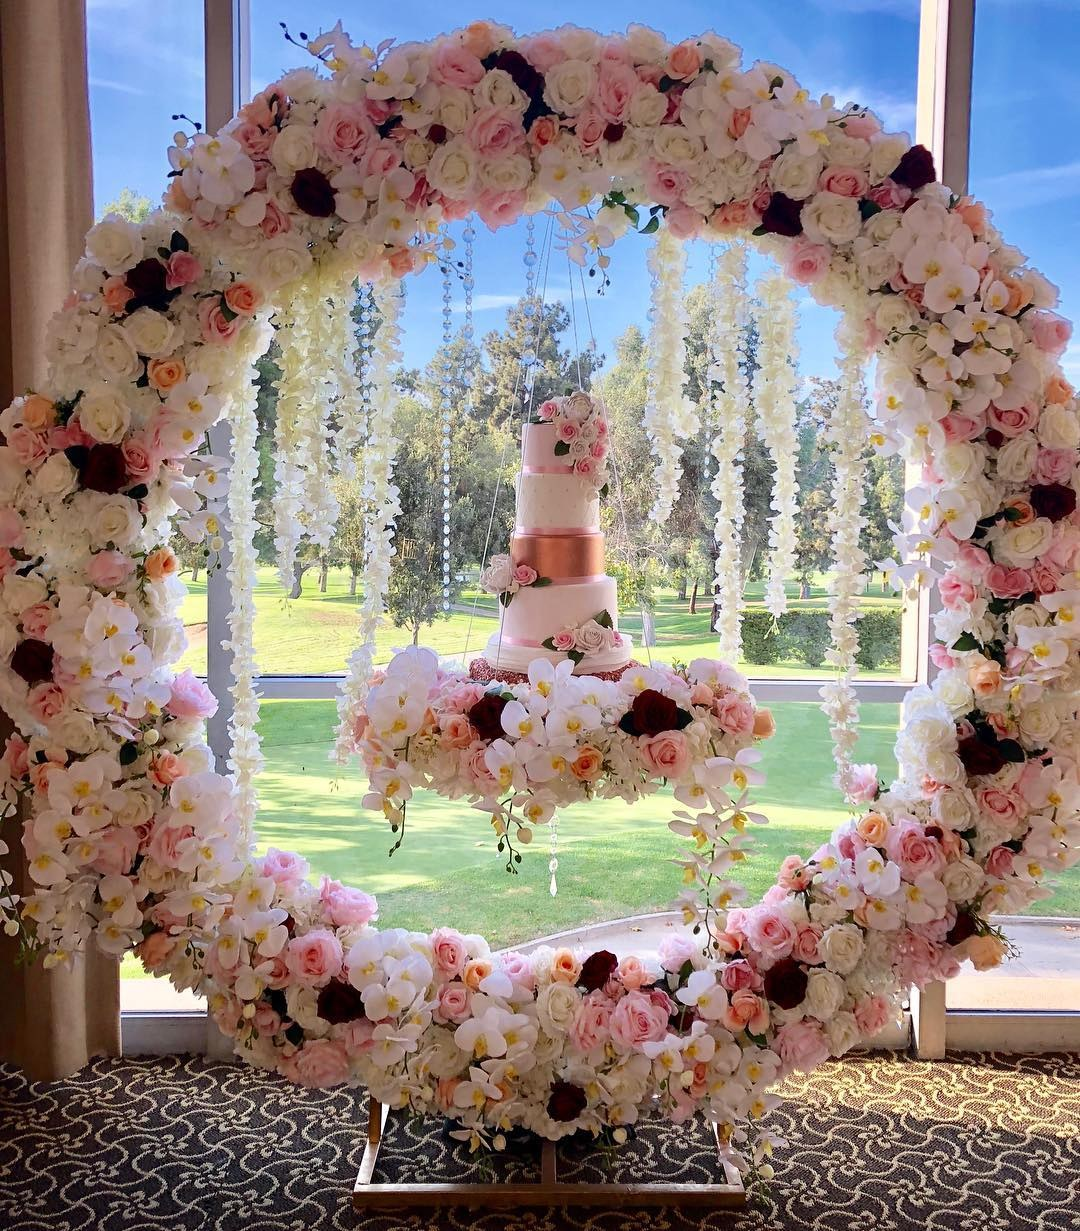 Christian Wedding Reception Ideas: Unique Wedding Table Ideas